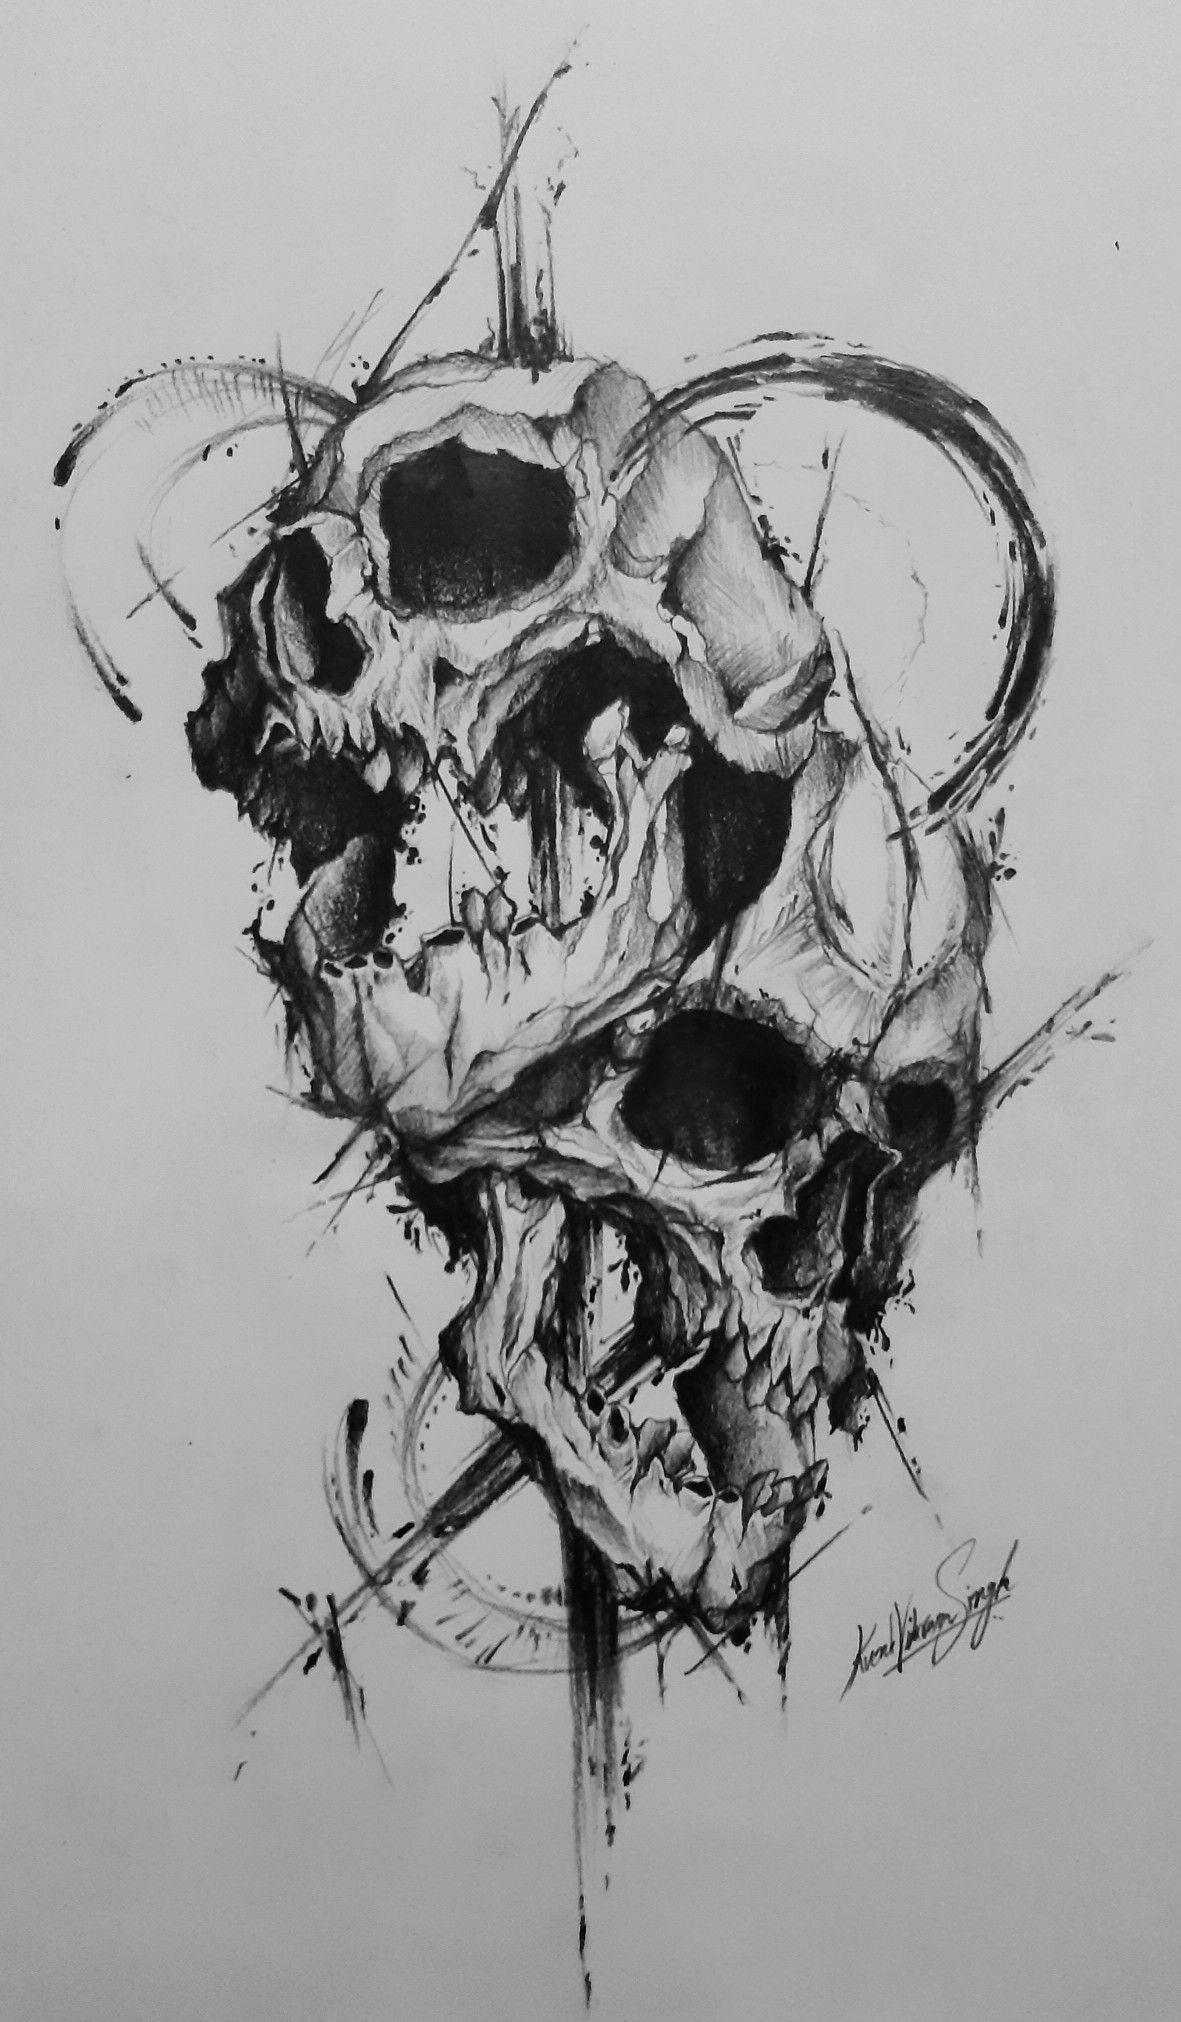 Pin By Kunal Vikram Singh On Tattoo Designs Skull Art Skull Tattoo Design Body Art Tattoos